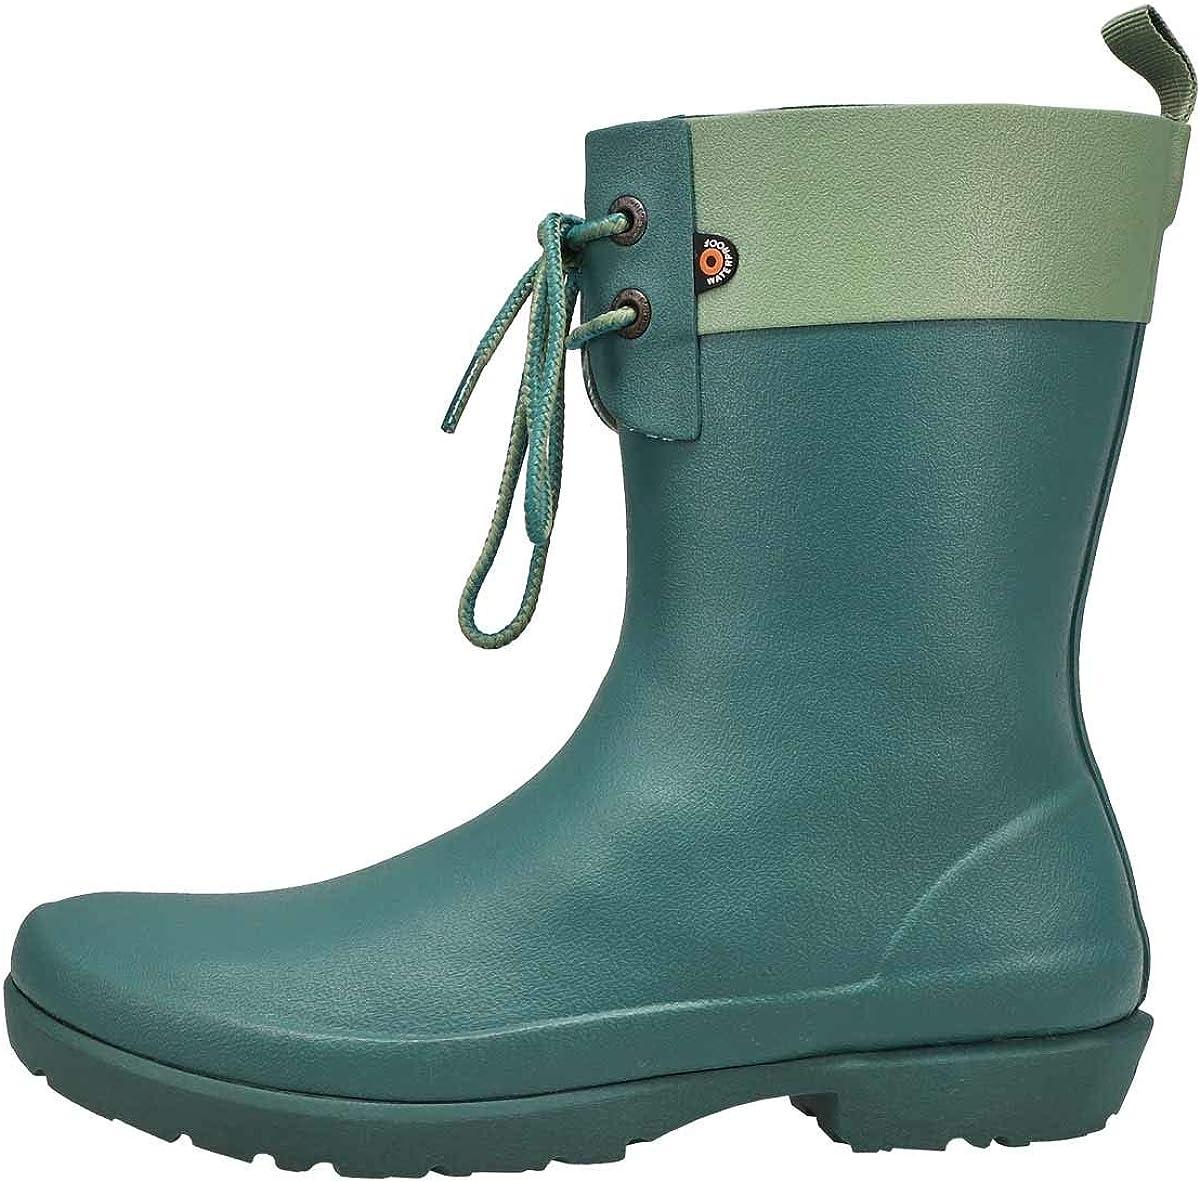 購買 BOGS 税込 Women's Flora 2 Rain Eye Boot